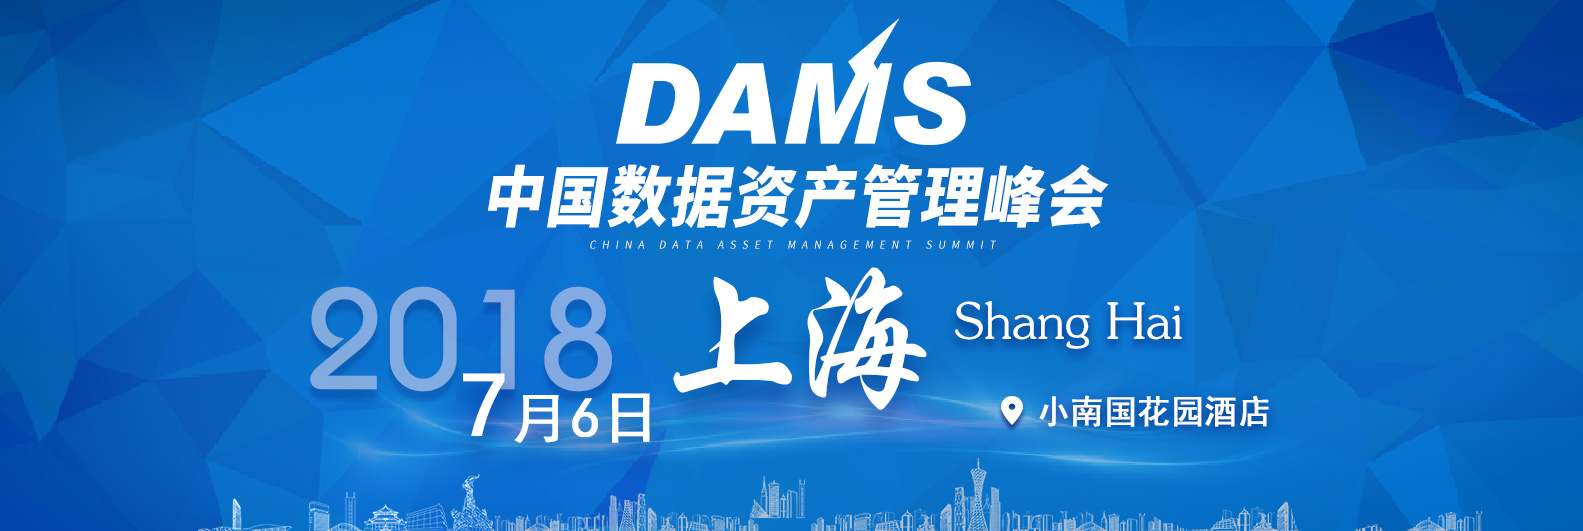 DAMS中国数据资产管理峰会-上海站